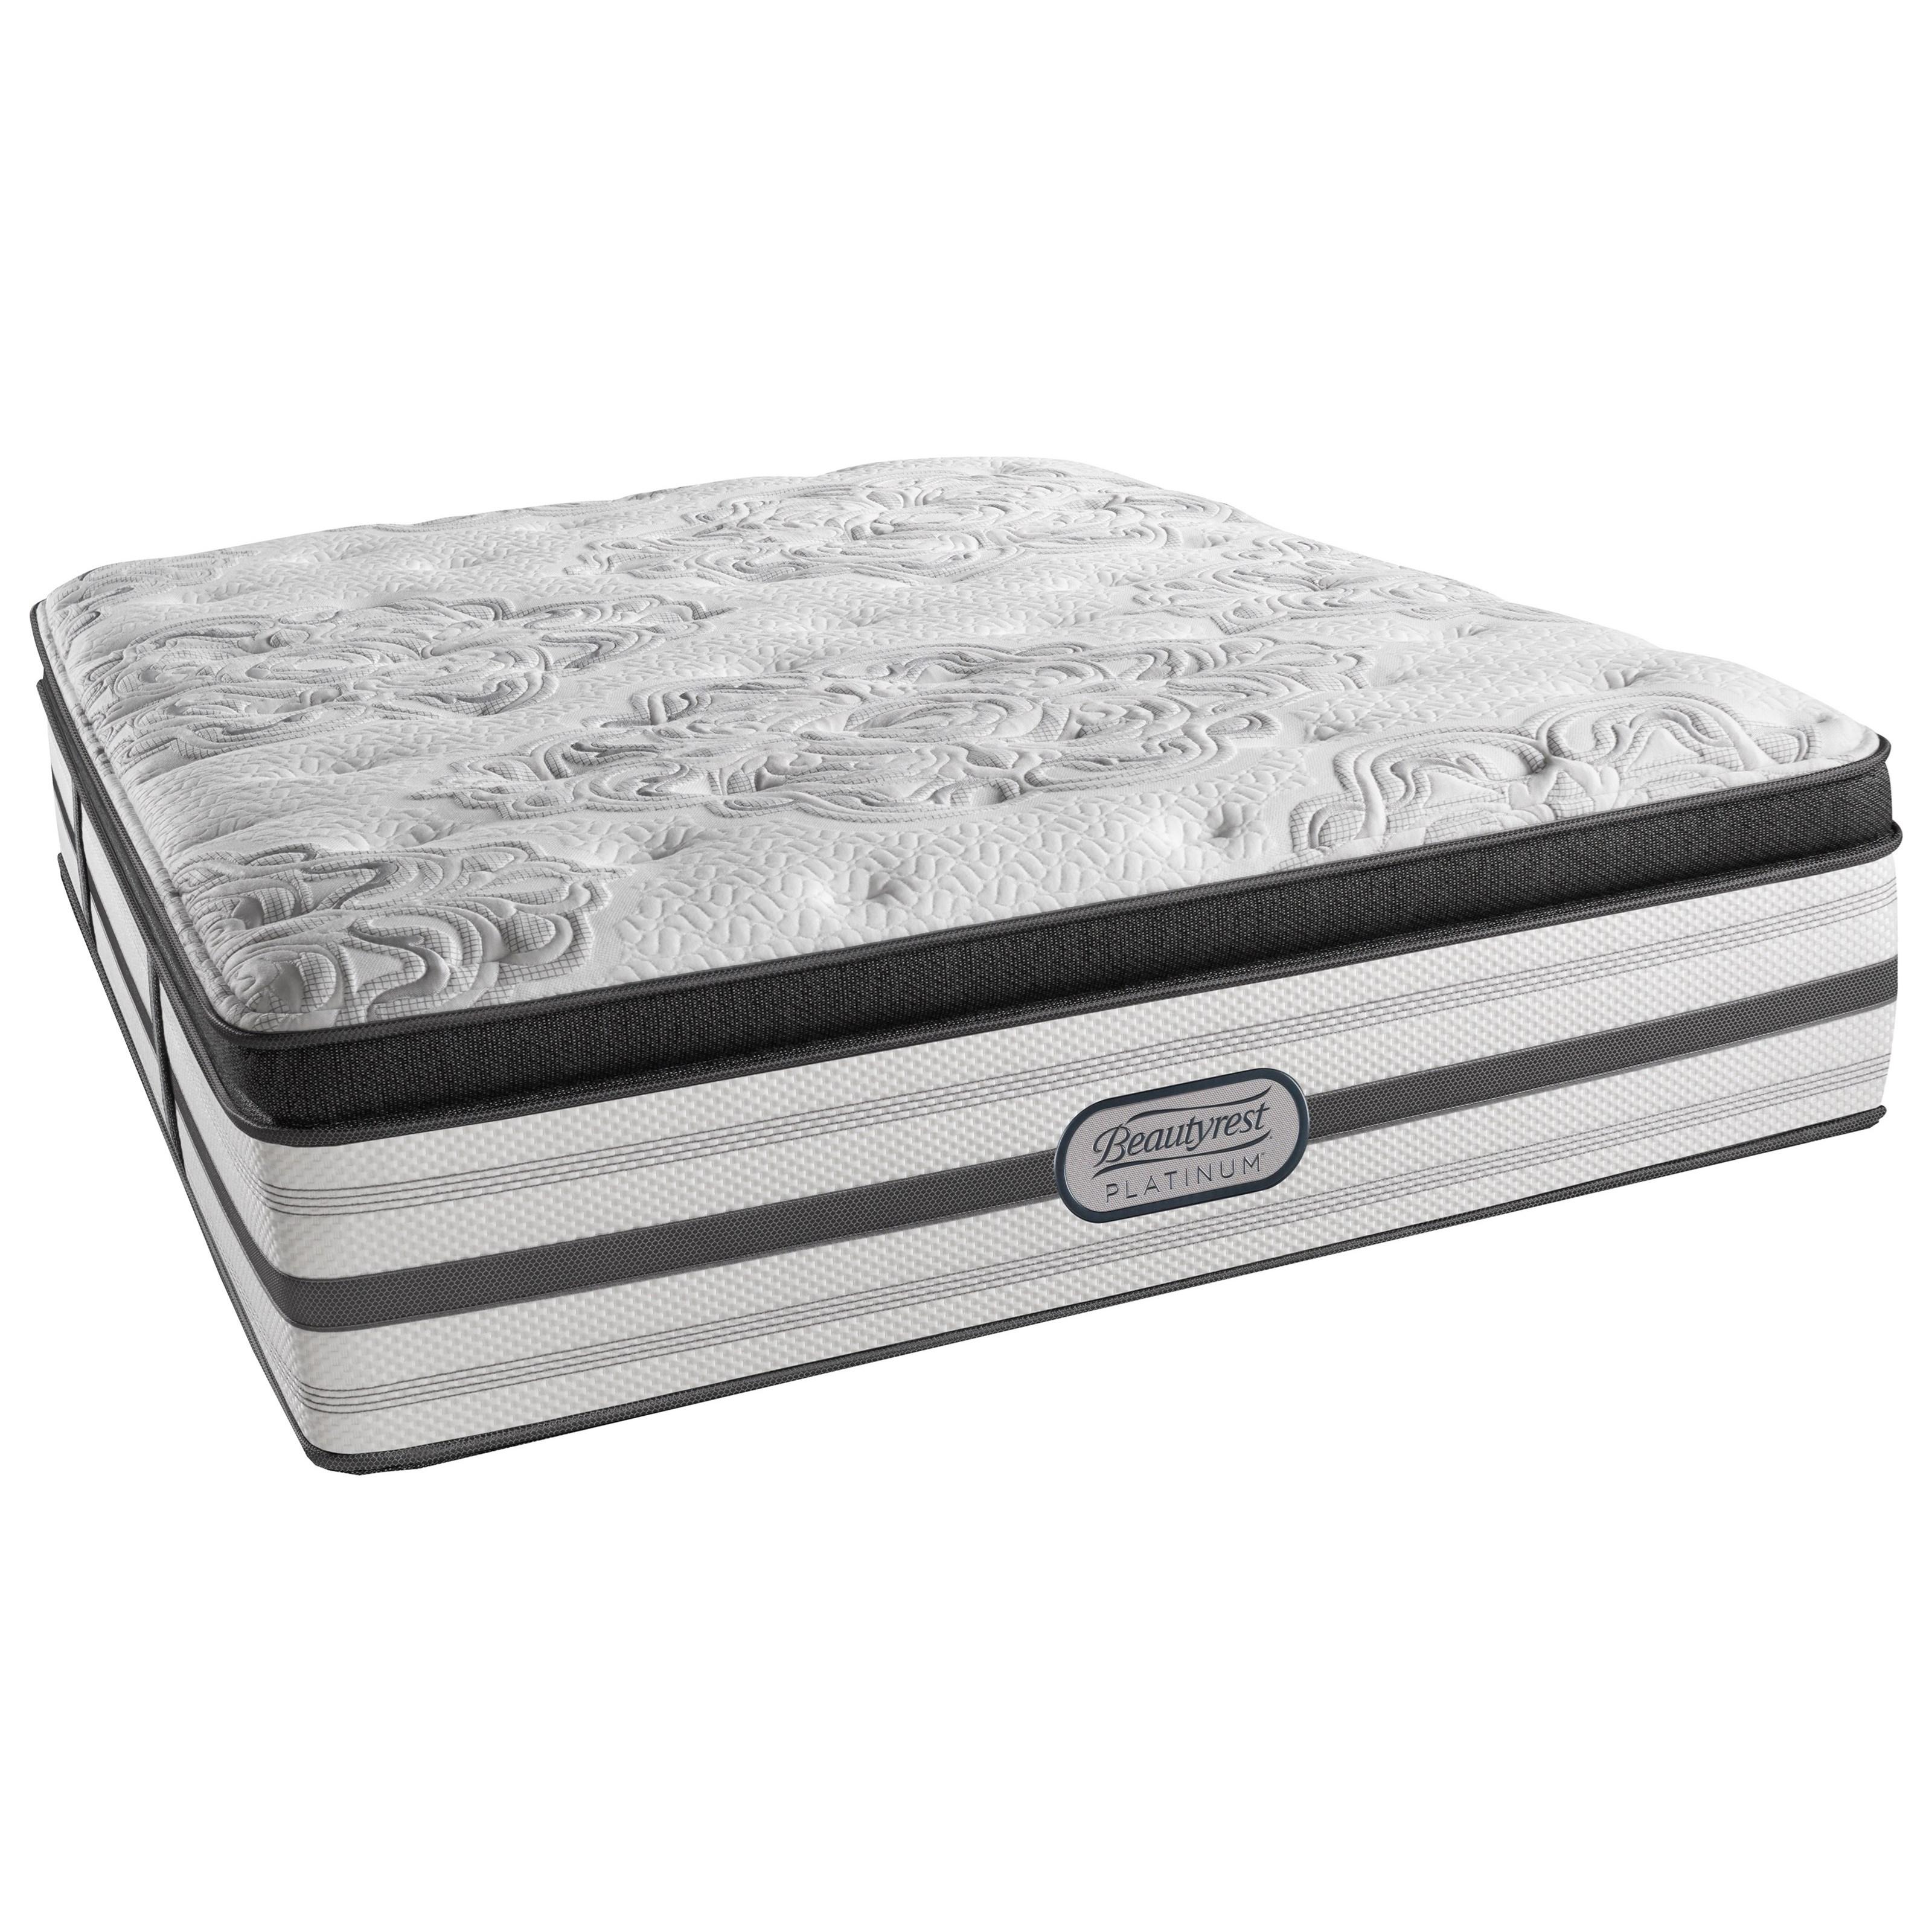 "Beautyrest Platinum Katherine Queen Luxury Firm Box PT 16 1/2"" Mattress - Item Number: LV4LFBT-Q"